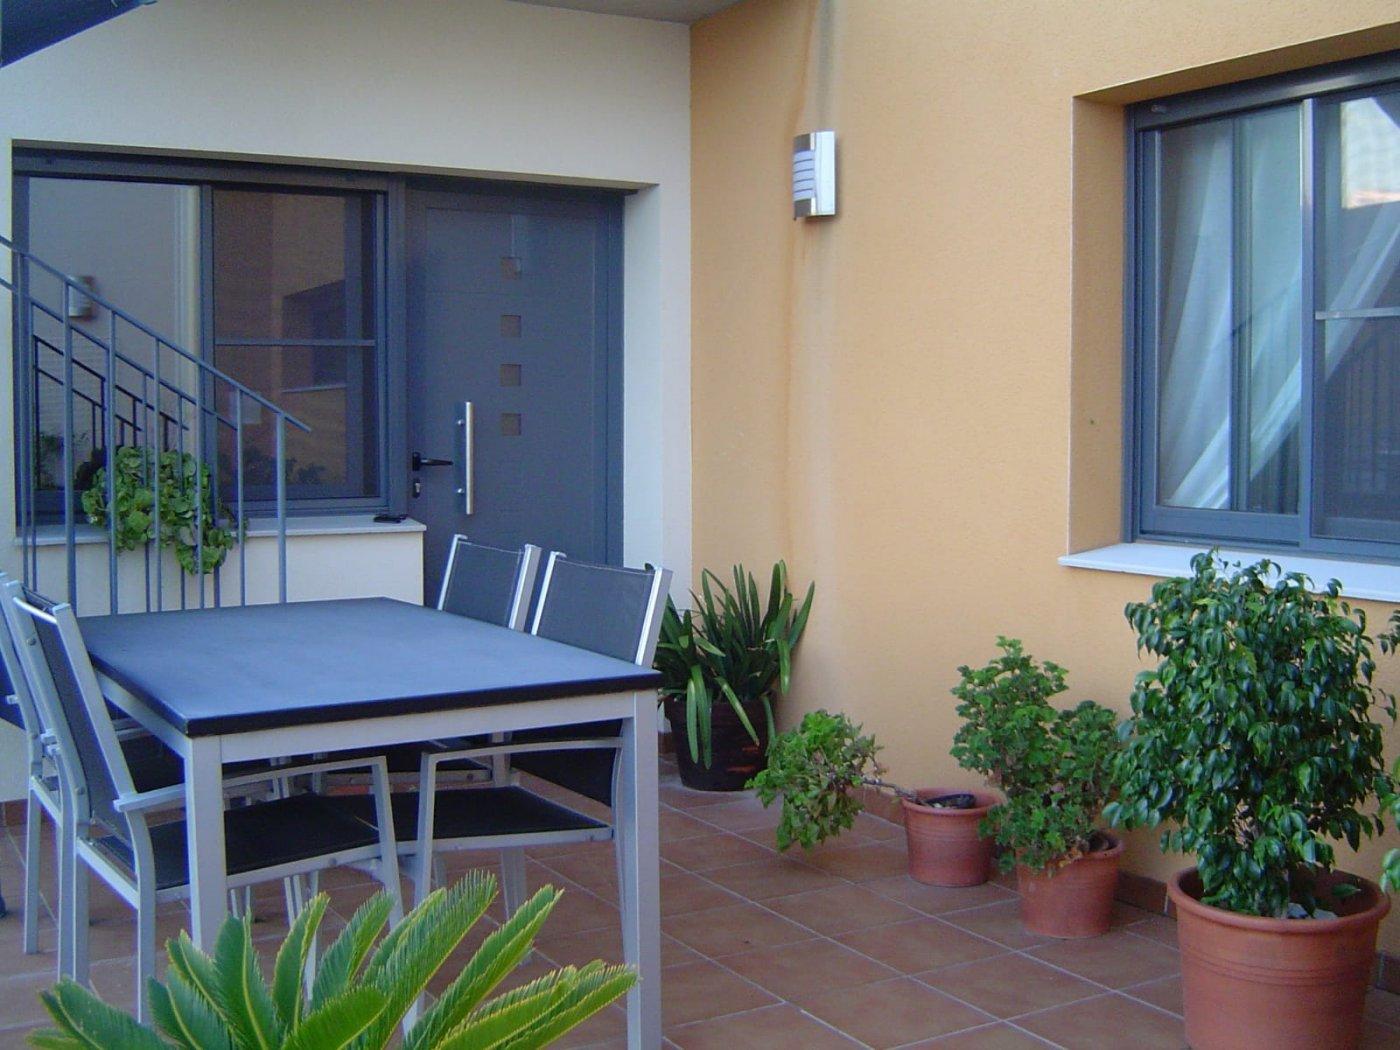 Flat for sale in Zona Mar, La Ampolla